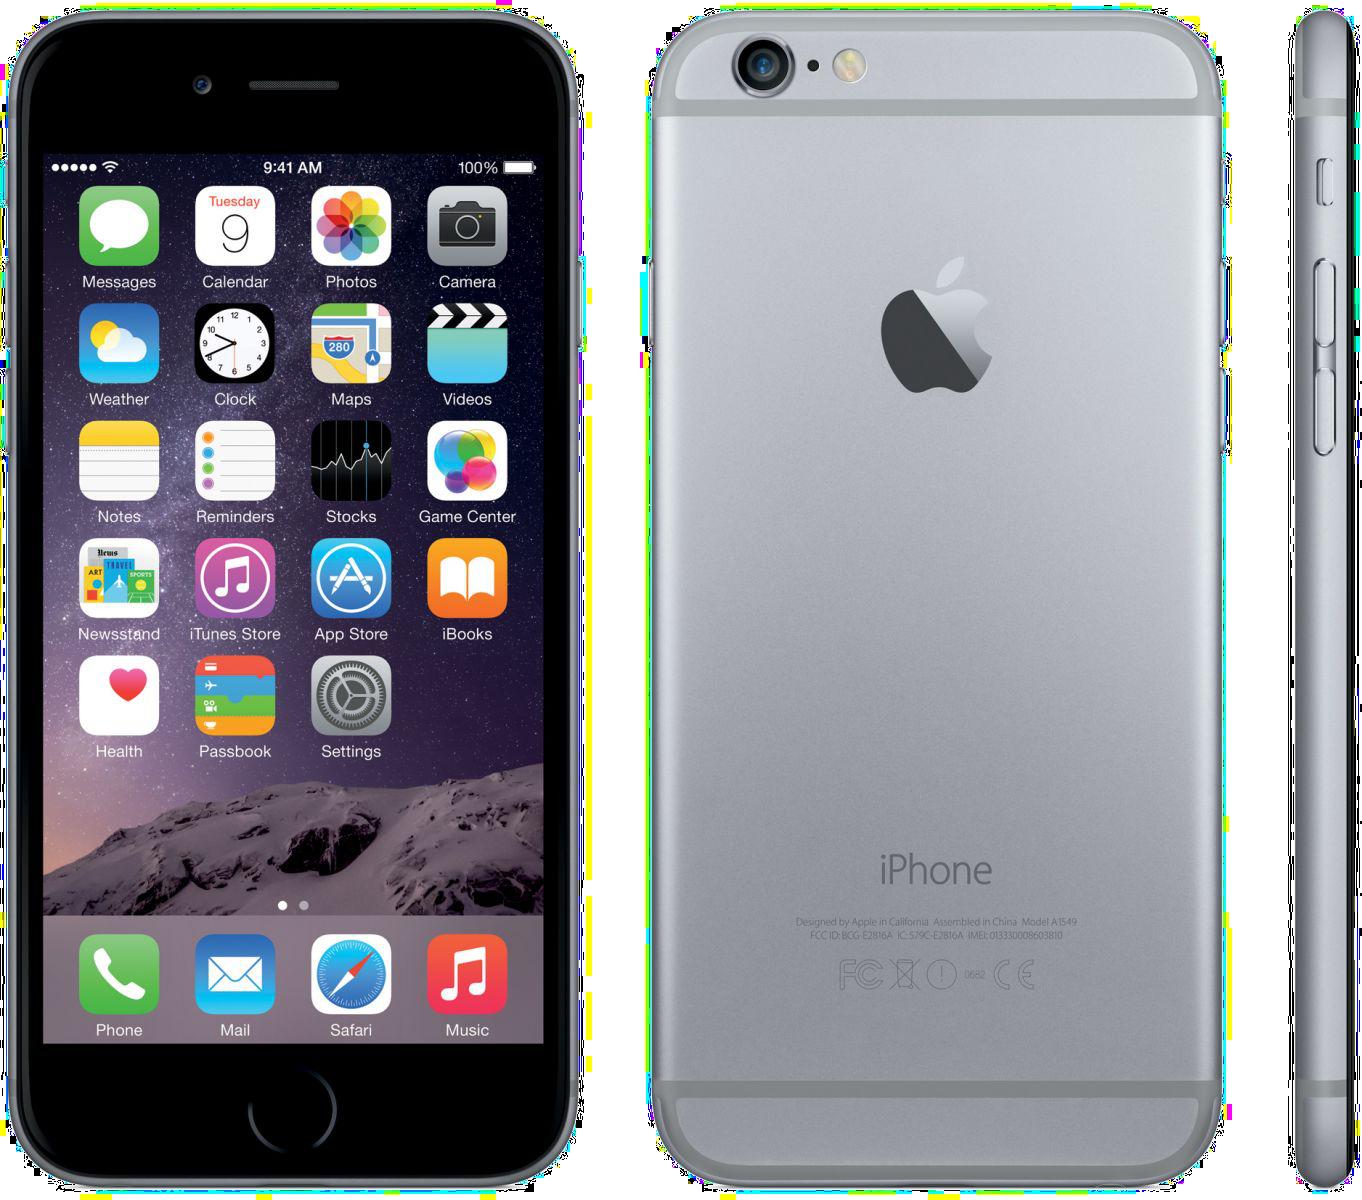 Fotografie Apple iPhone 6, recenze, obaly, fólie, tvrzená skla, ČirýiPhone.cz